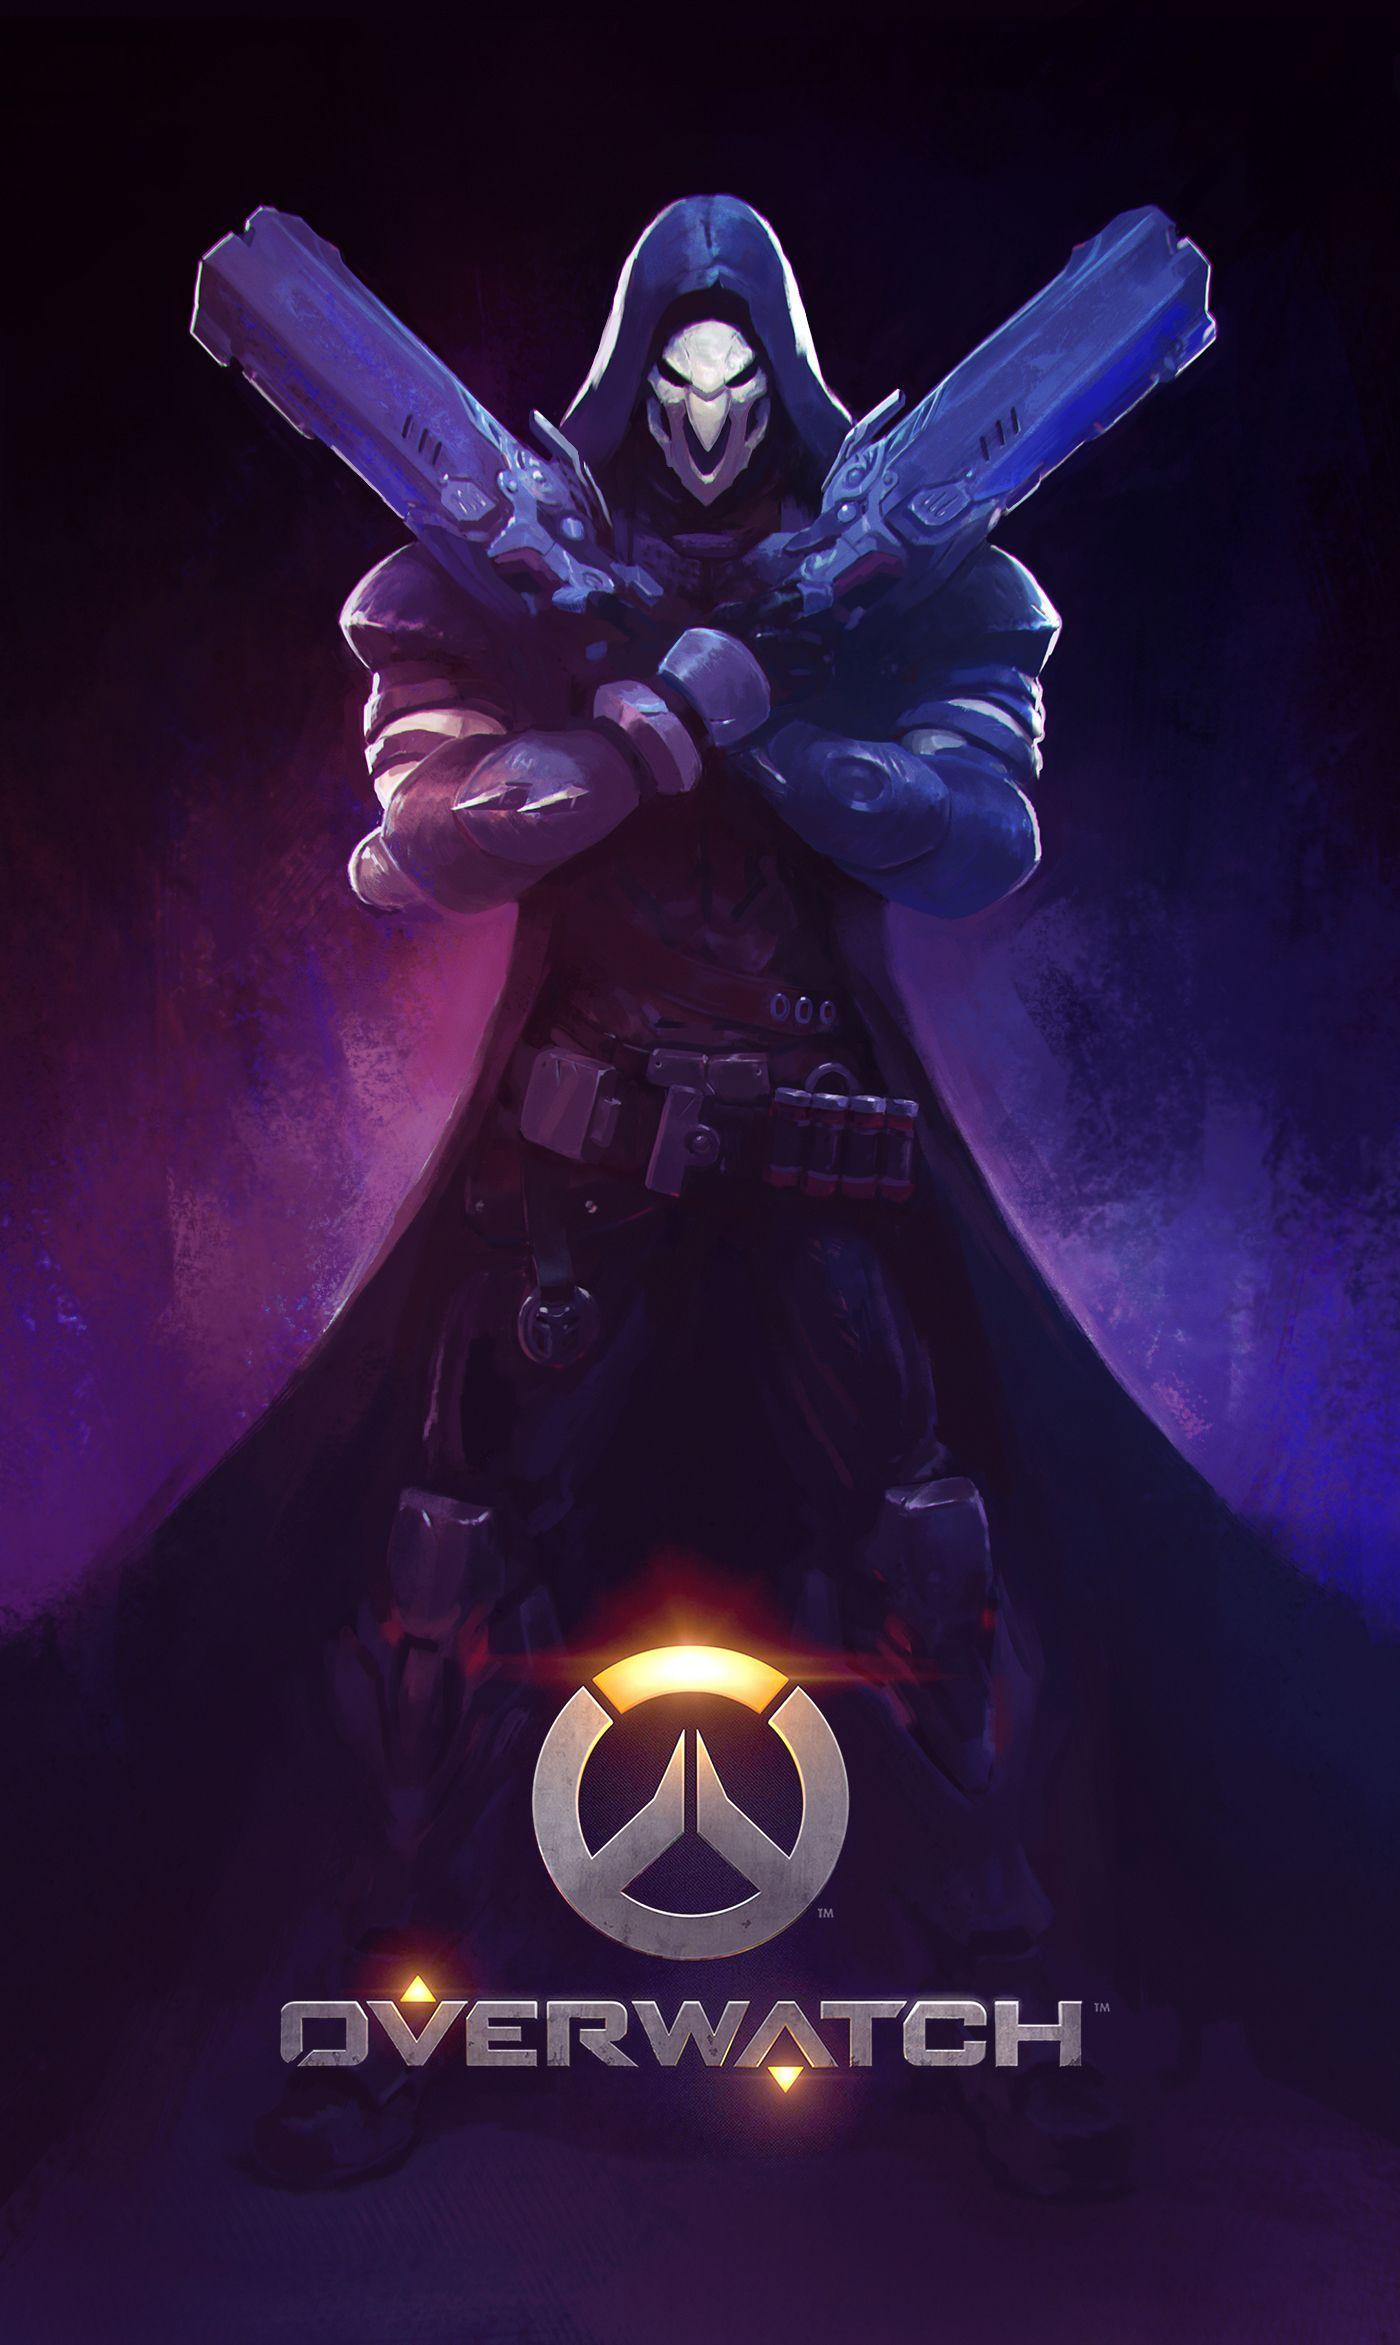 Pin By Joel Reynoso On Blizzard Pinterest Overwatch Overwatch